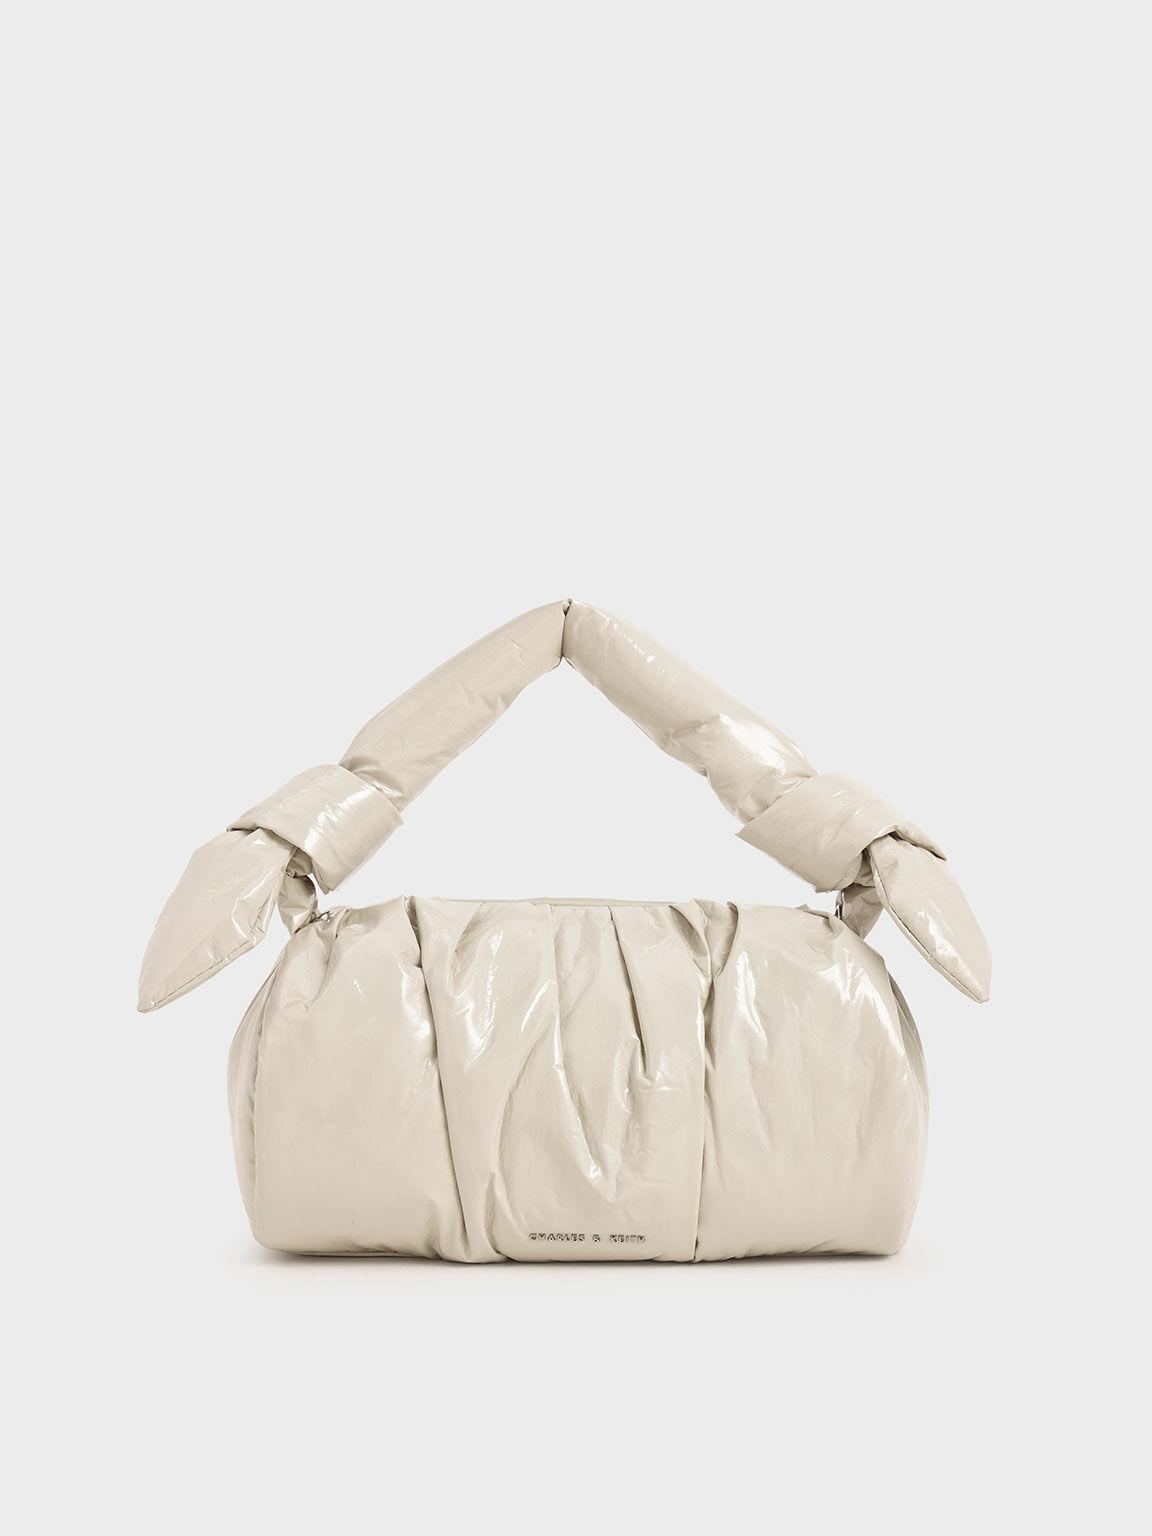 The Kelly Monogram 2pc purse in beige  Personalized handbags